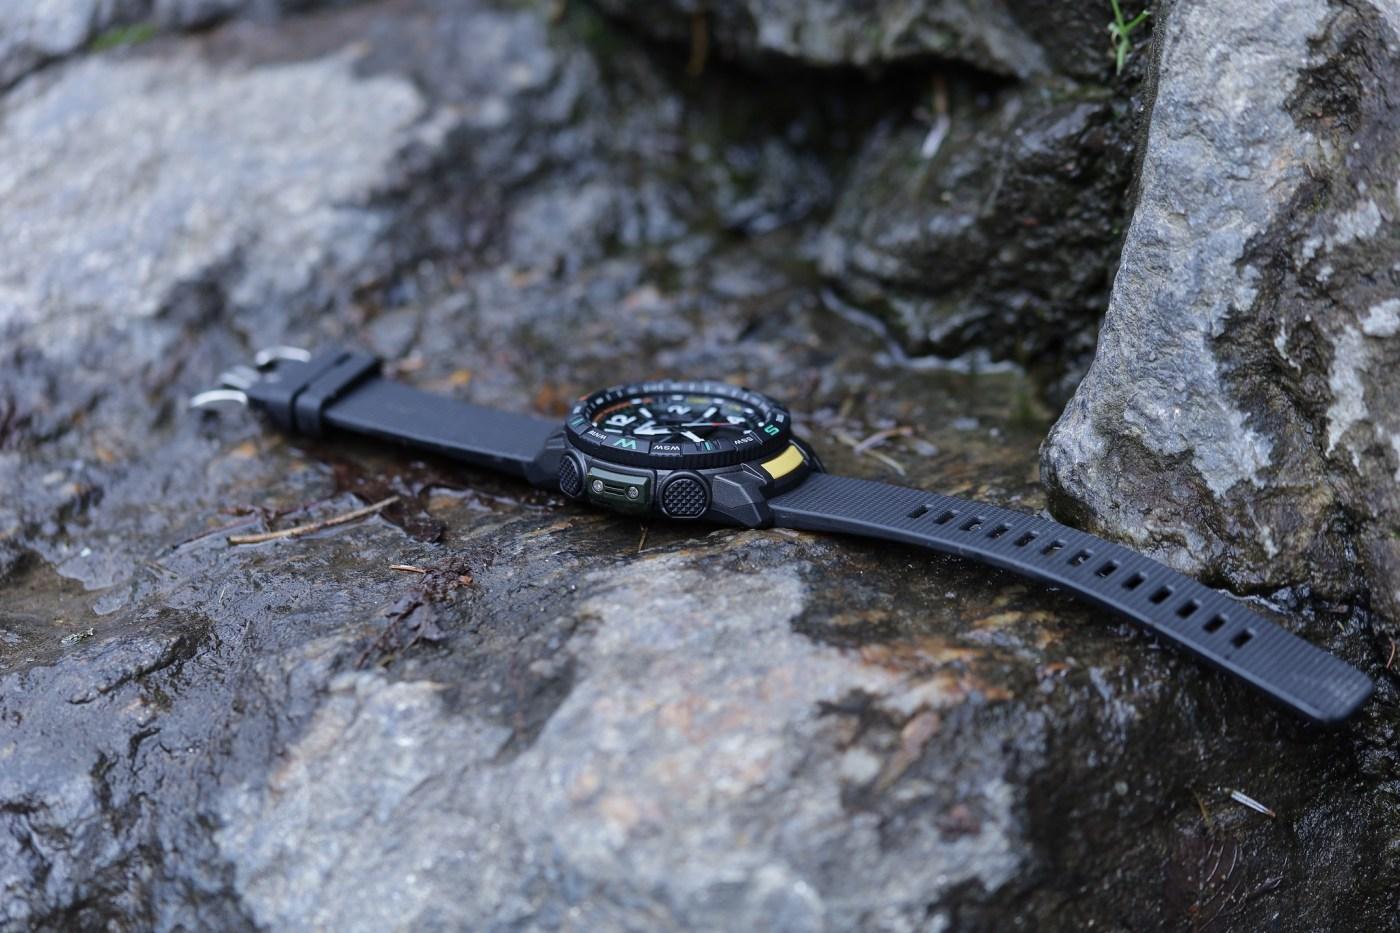 Casio Pro Trek PRT-B50 sitting flat on rock